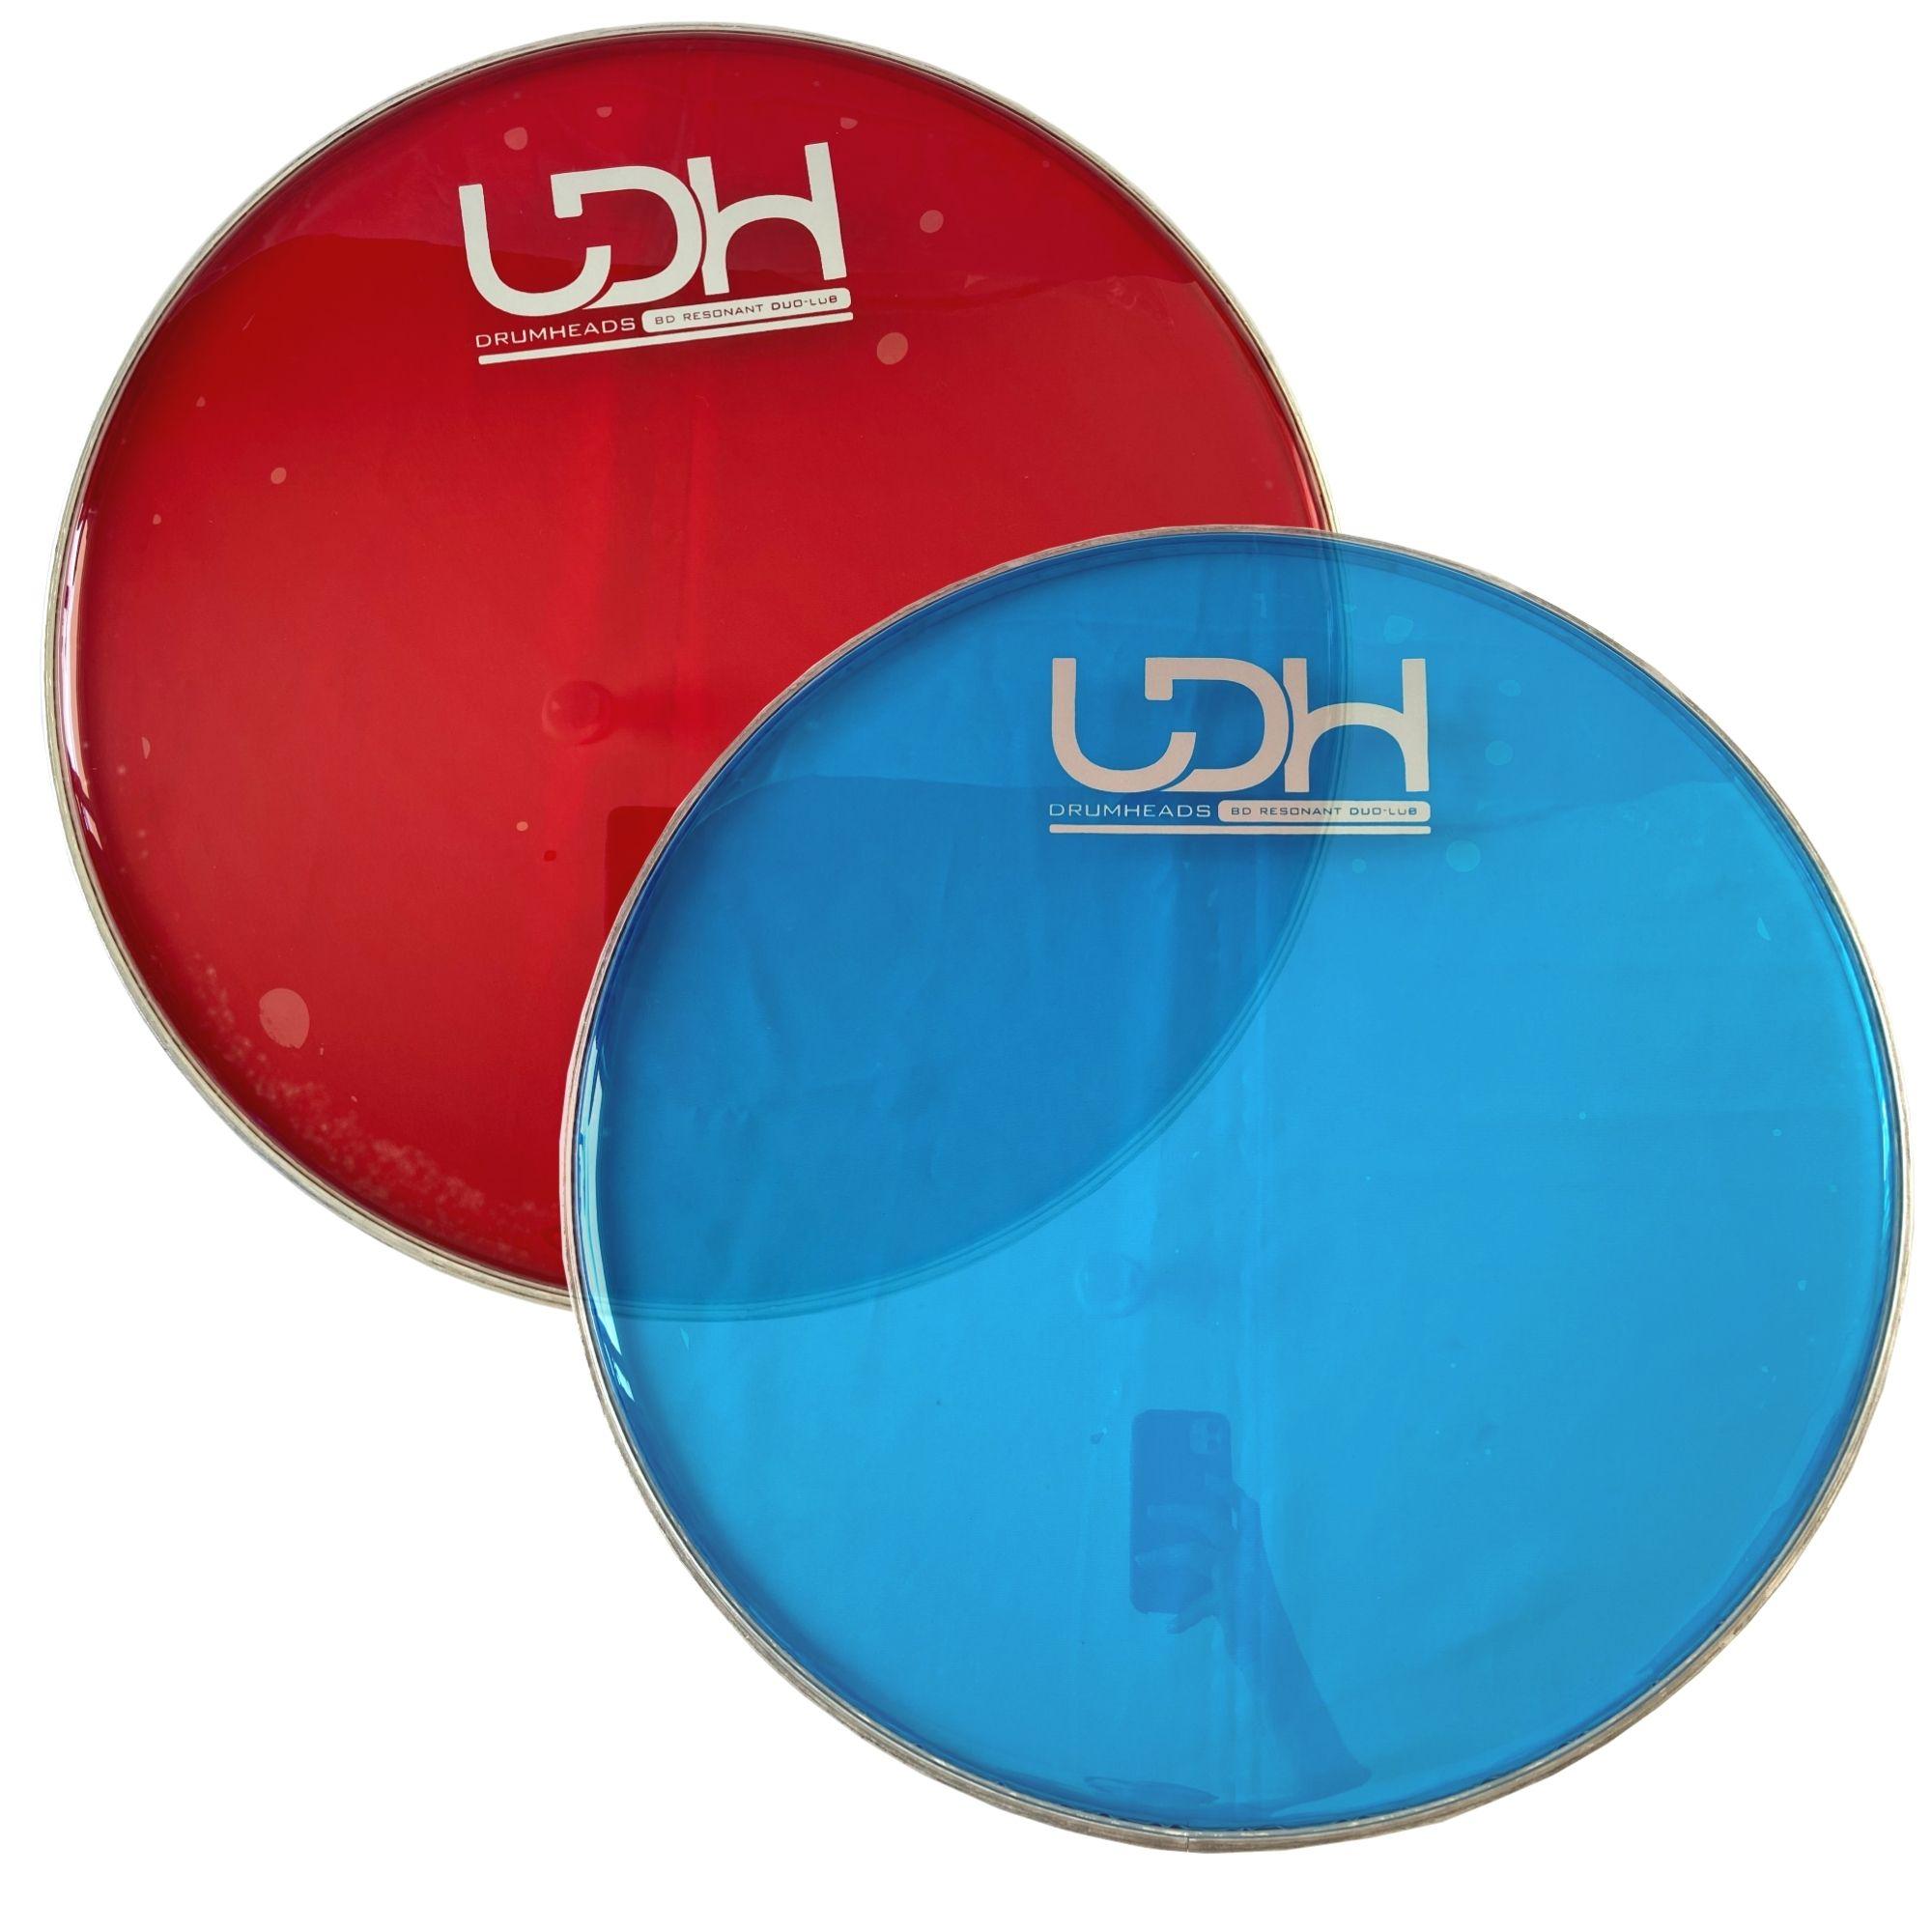 "Pele Hidráulica Duo Lub Clear Luen Drumheads LDH 08"" para Bateria."